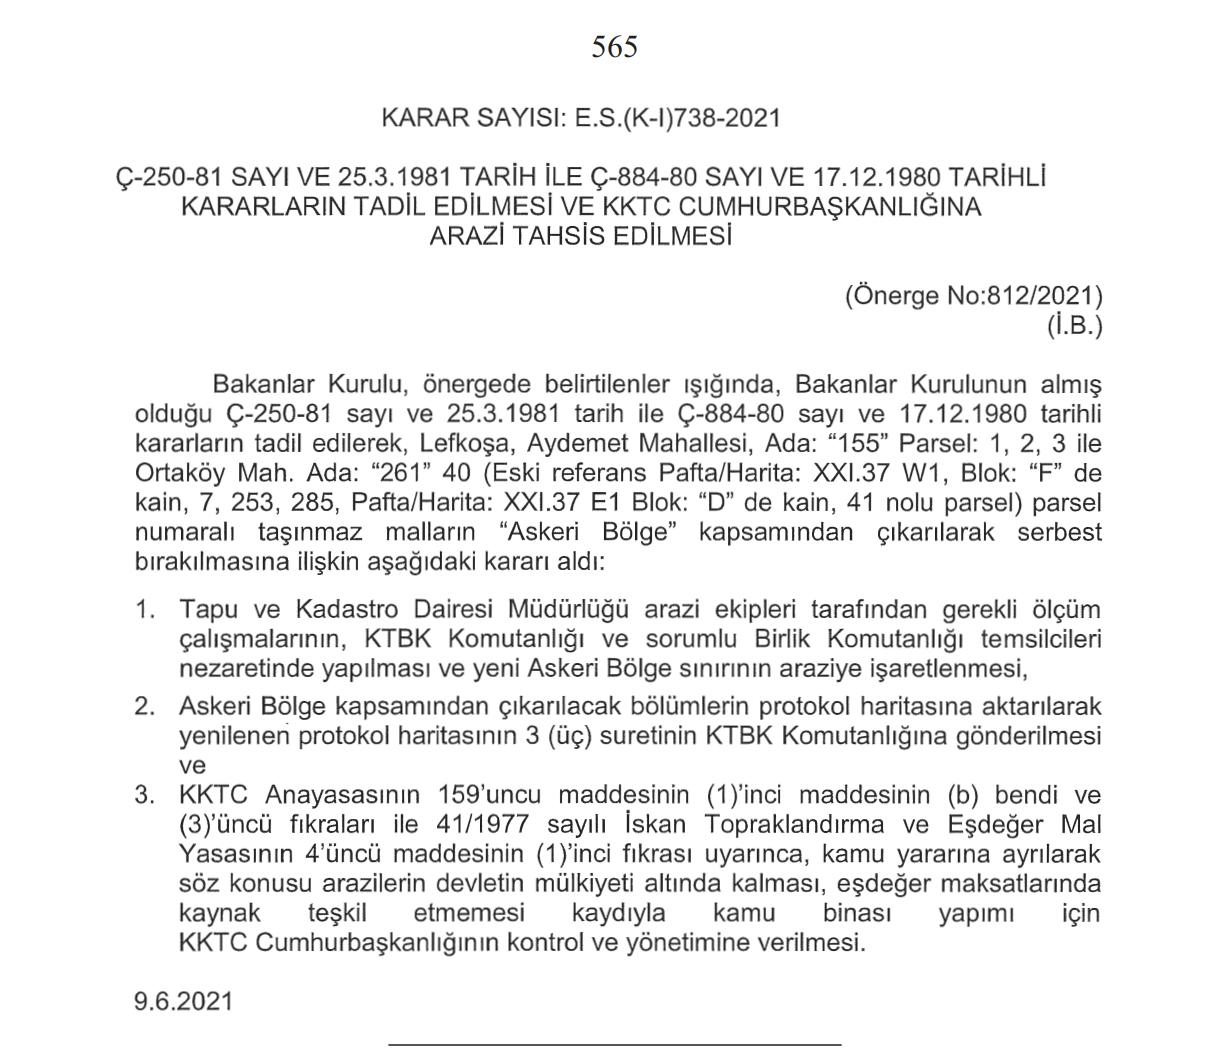 ozgur_gazete_kibris_cumhurbaskanligi_sarayi